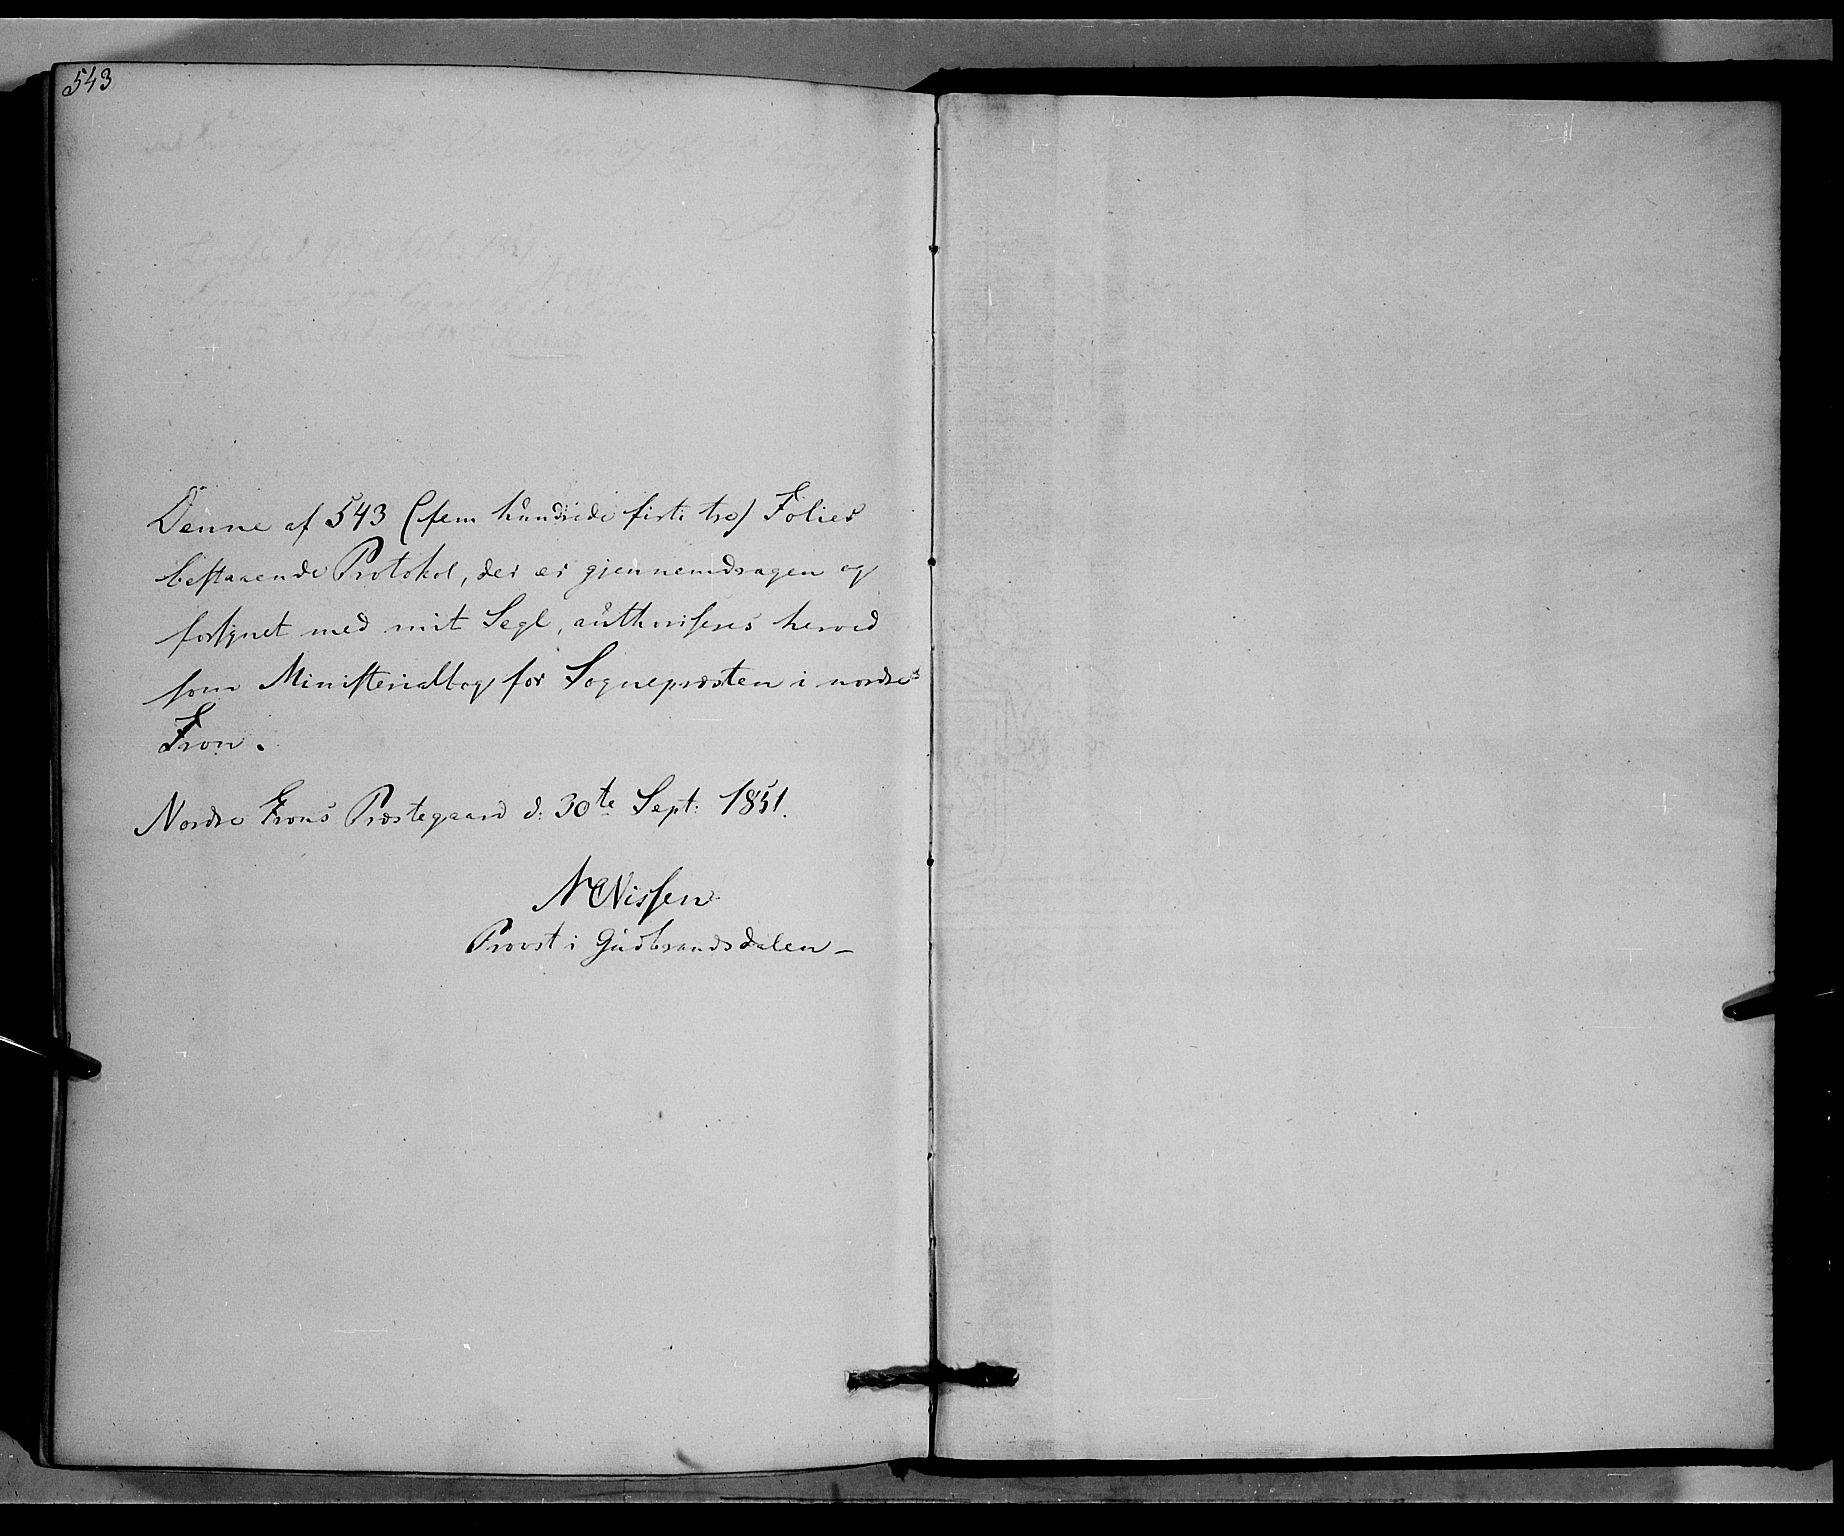 SAH, Nord-Fron prestekontor, Ministerialbok nr. 1, 1851-1864, s. 543